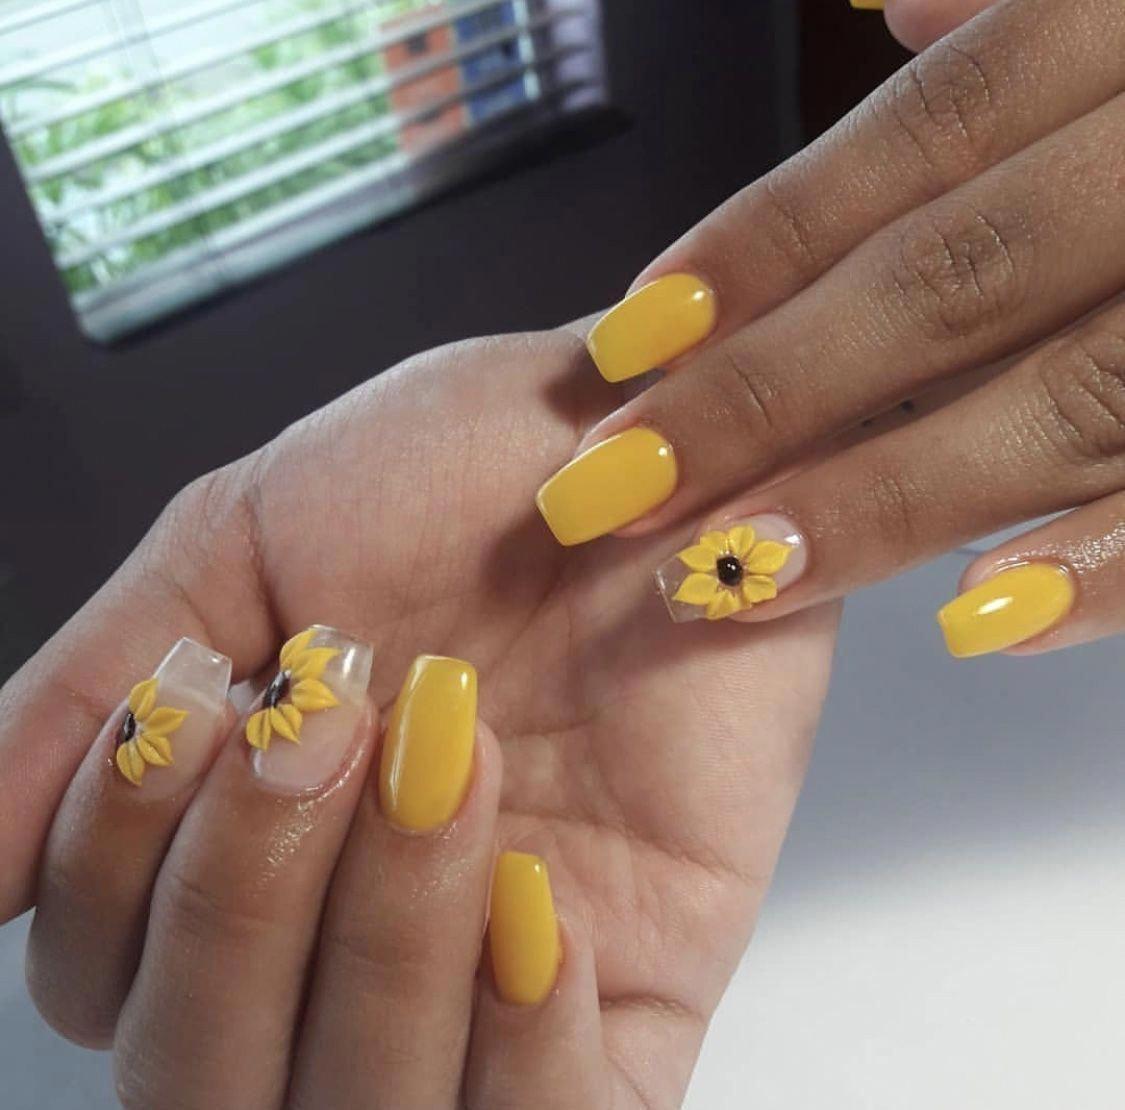 Nailart Yellow Acrylics Sunflower Design Nails 2018 Beautifulacrylicnails Acrylicnailsalmond Nehty